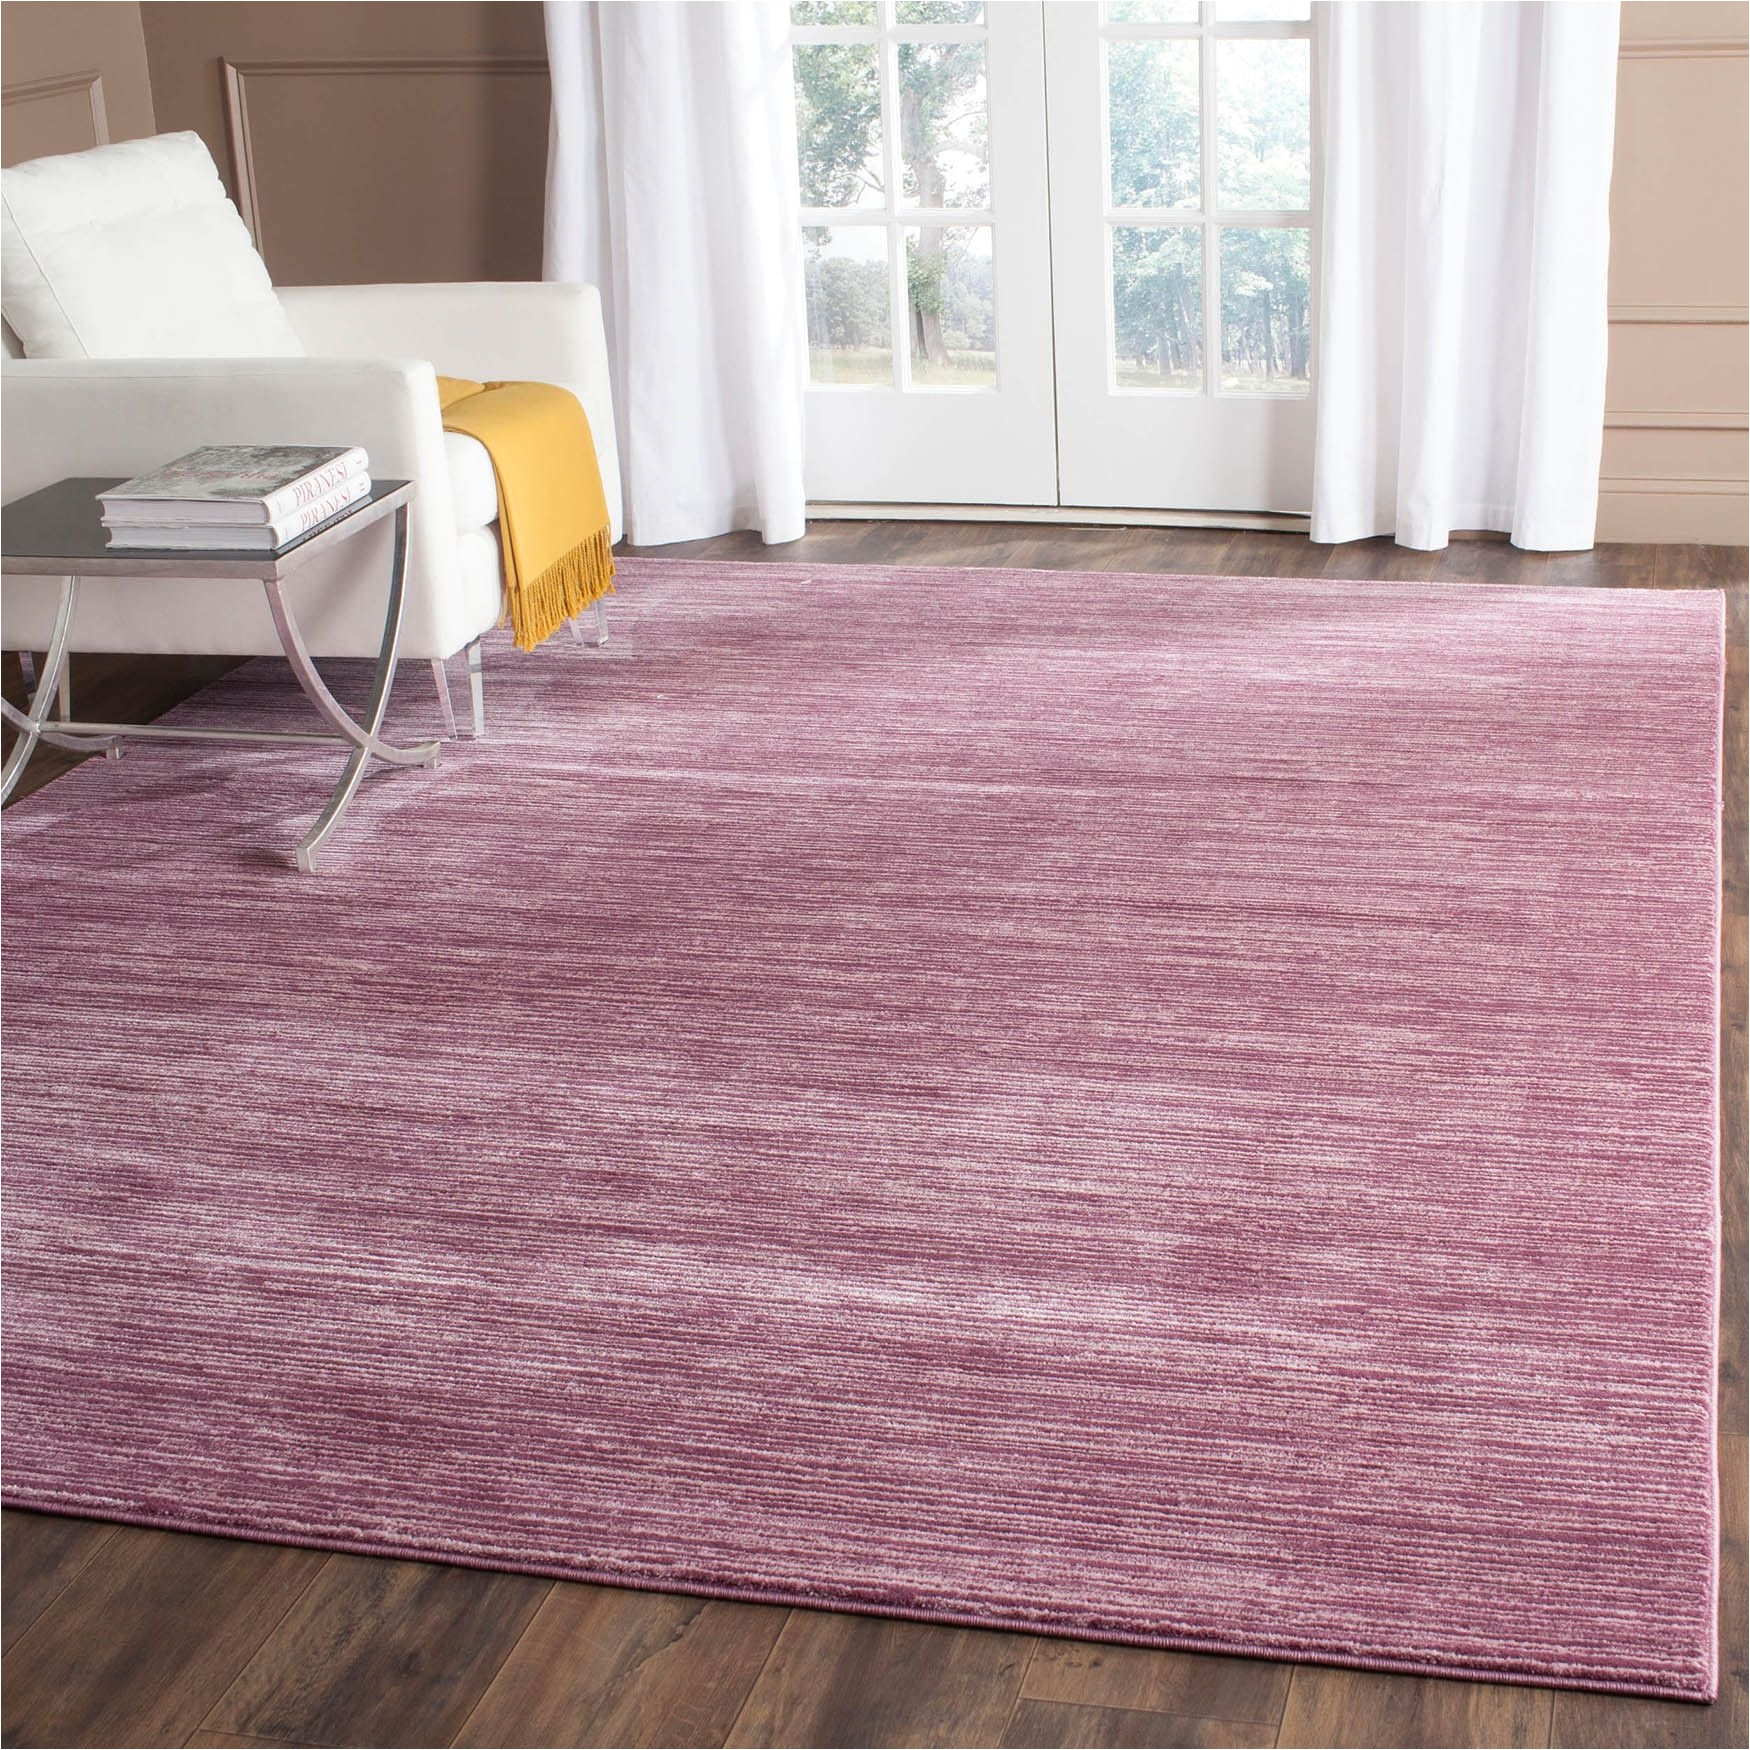 Light Pink area Rug 8×10 Safavieh Vision Contemporary tonal Purple Pink area Rug 8 X 10